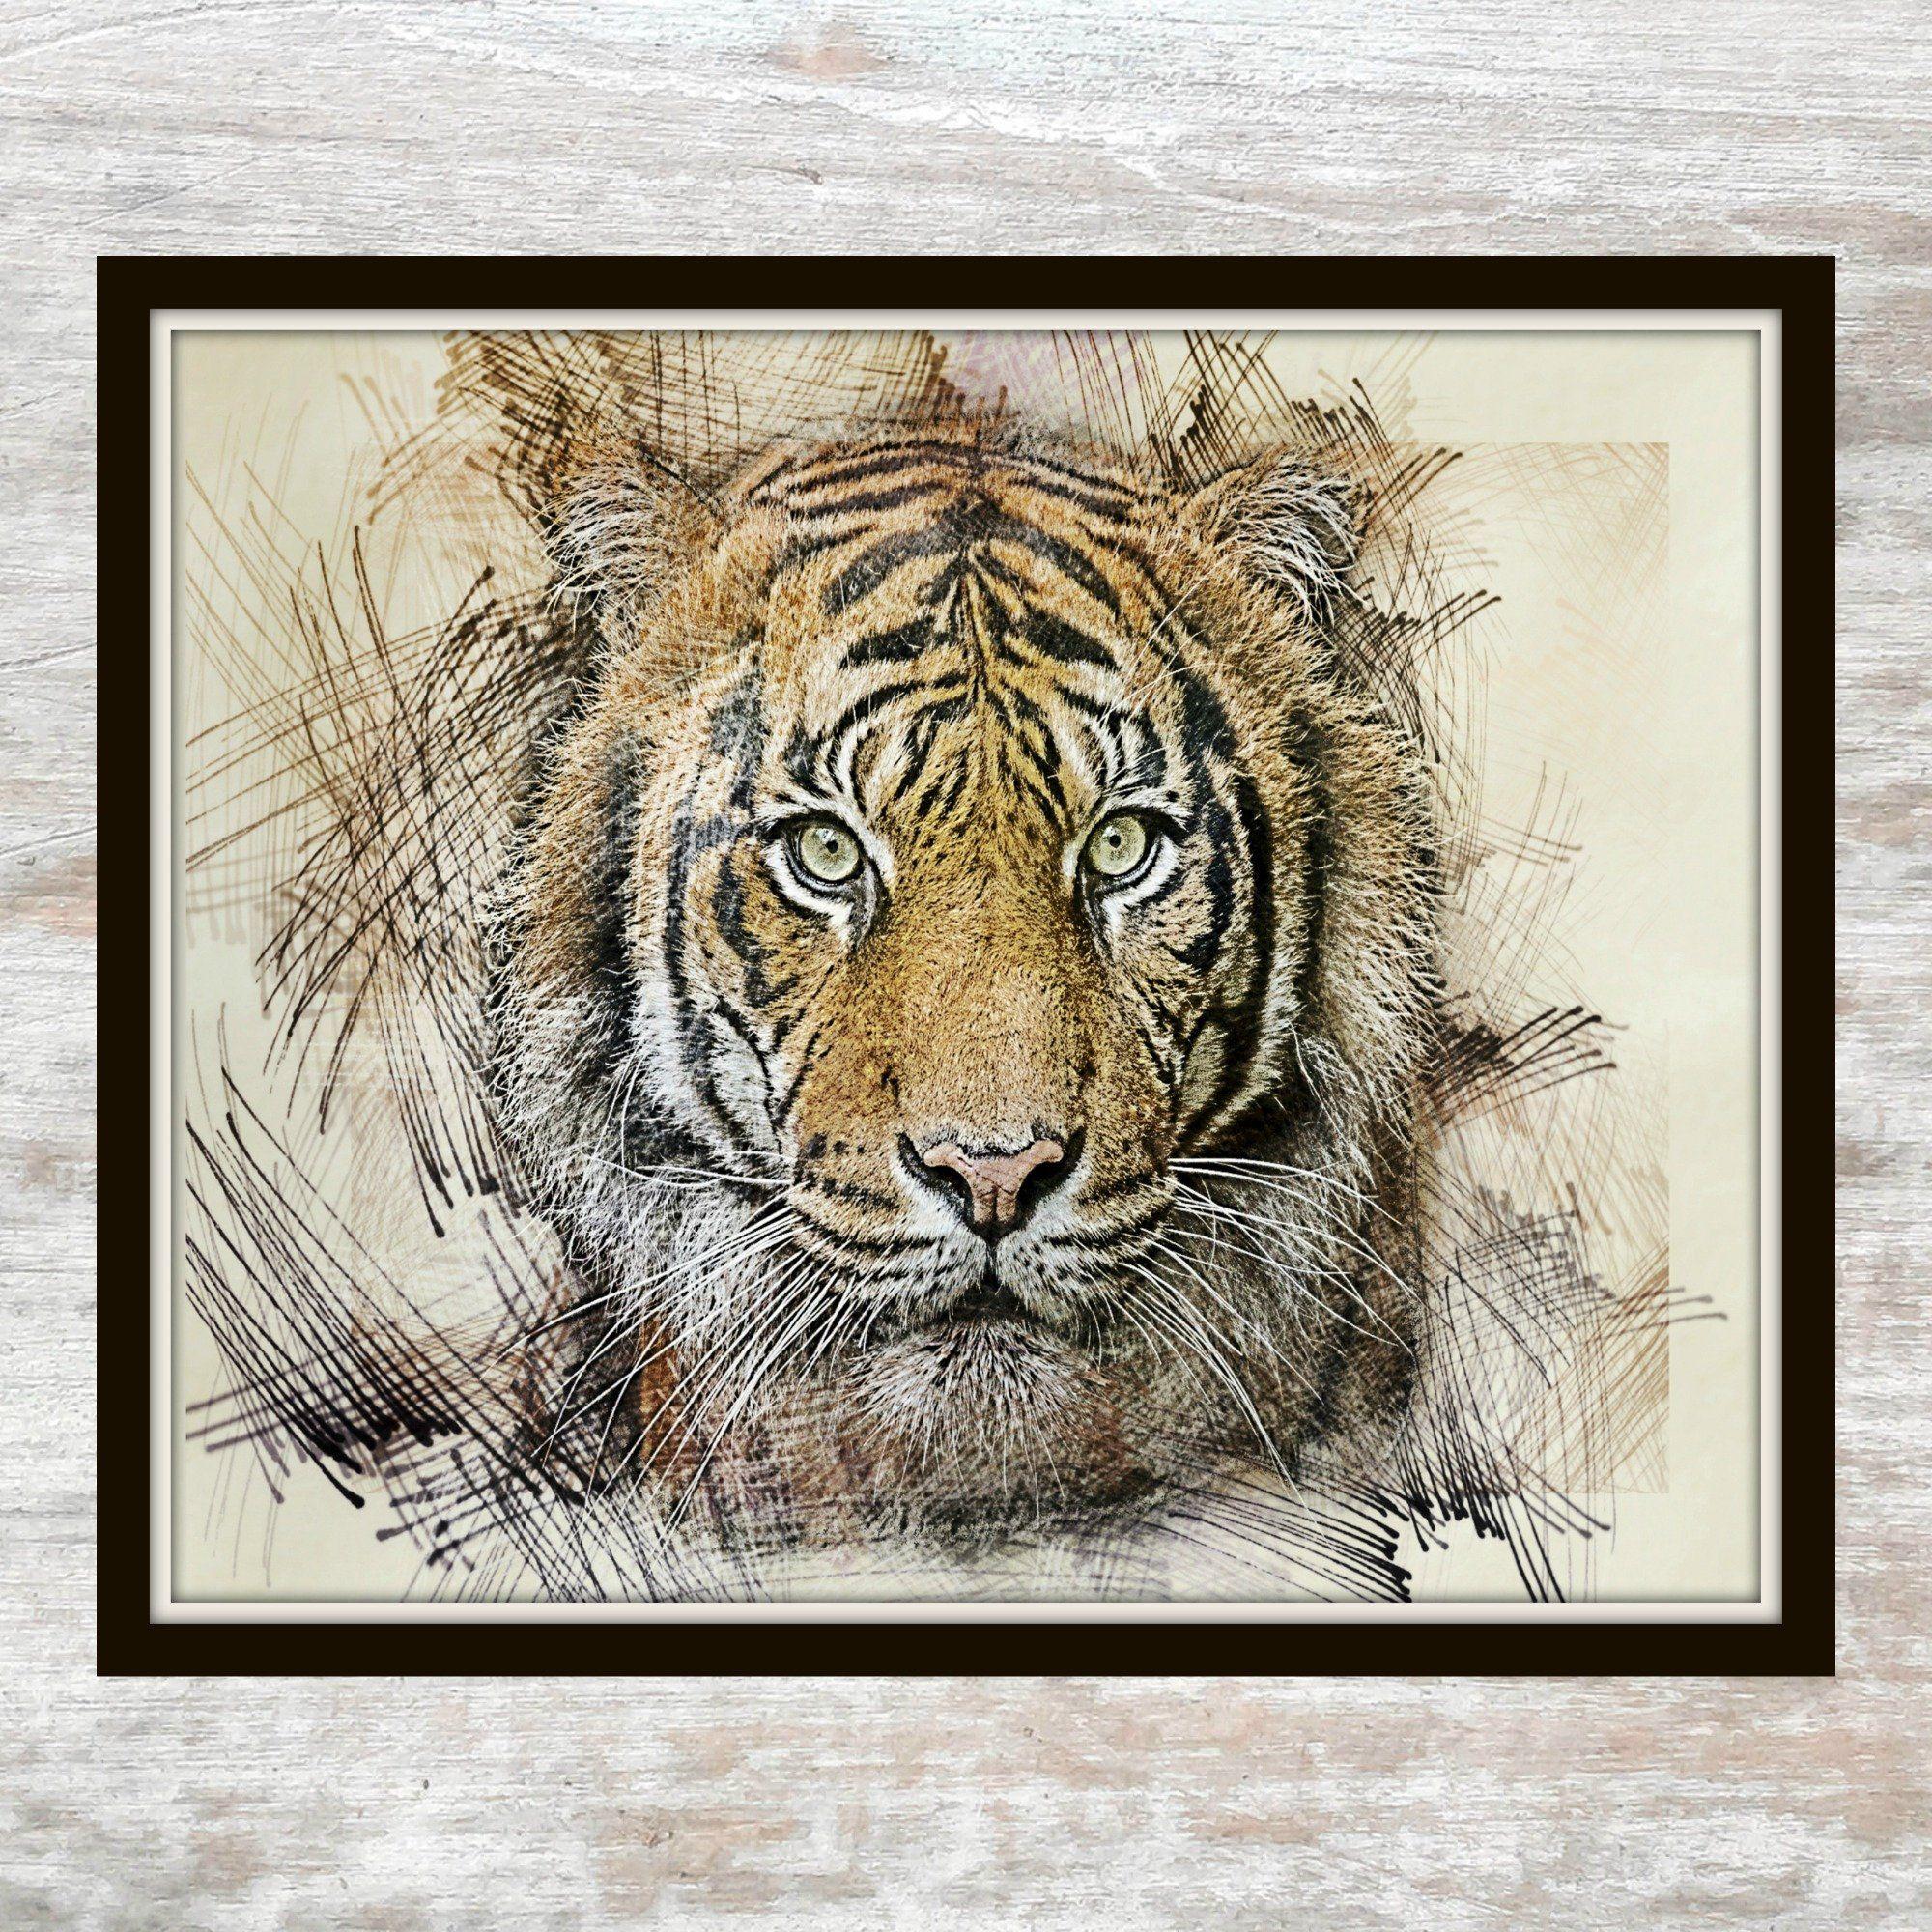 Orange Tiger - Orange Tiger Printable - Tiger Printable